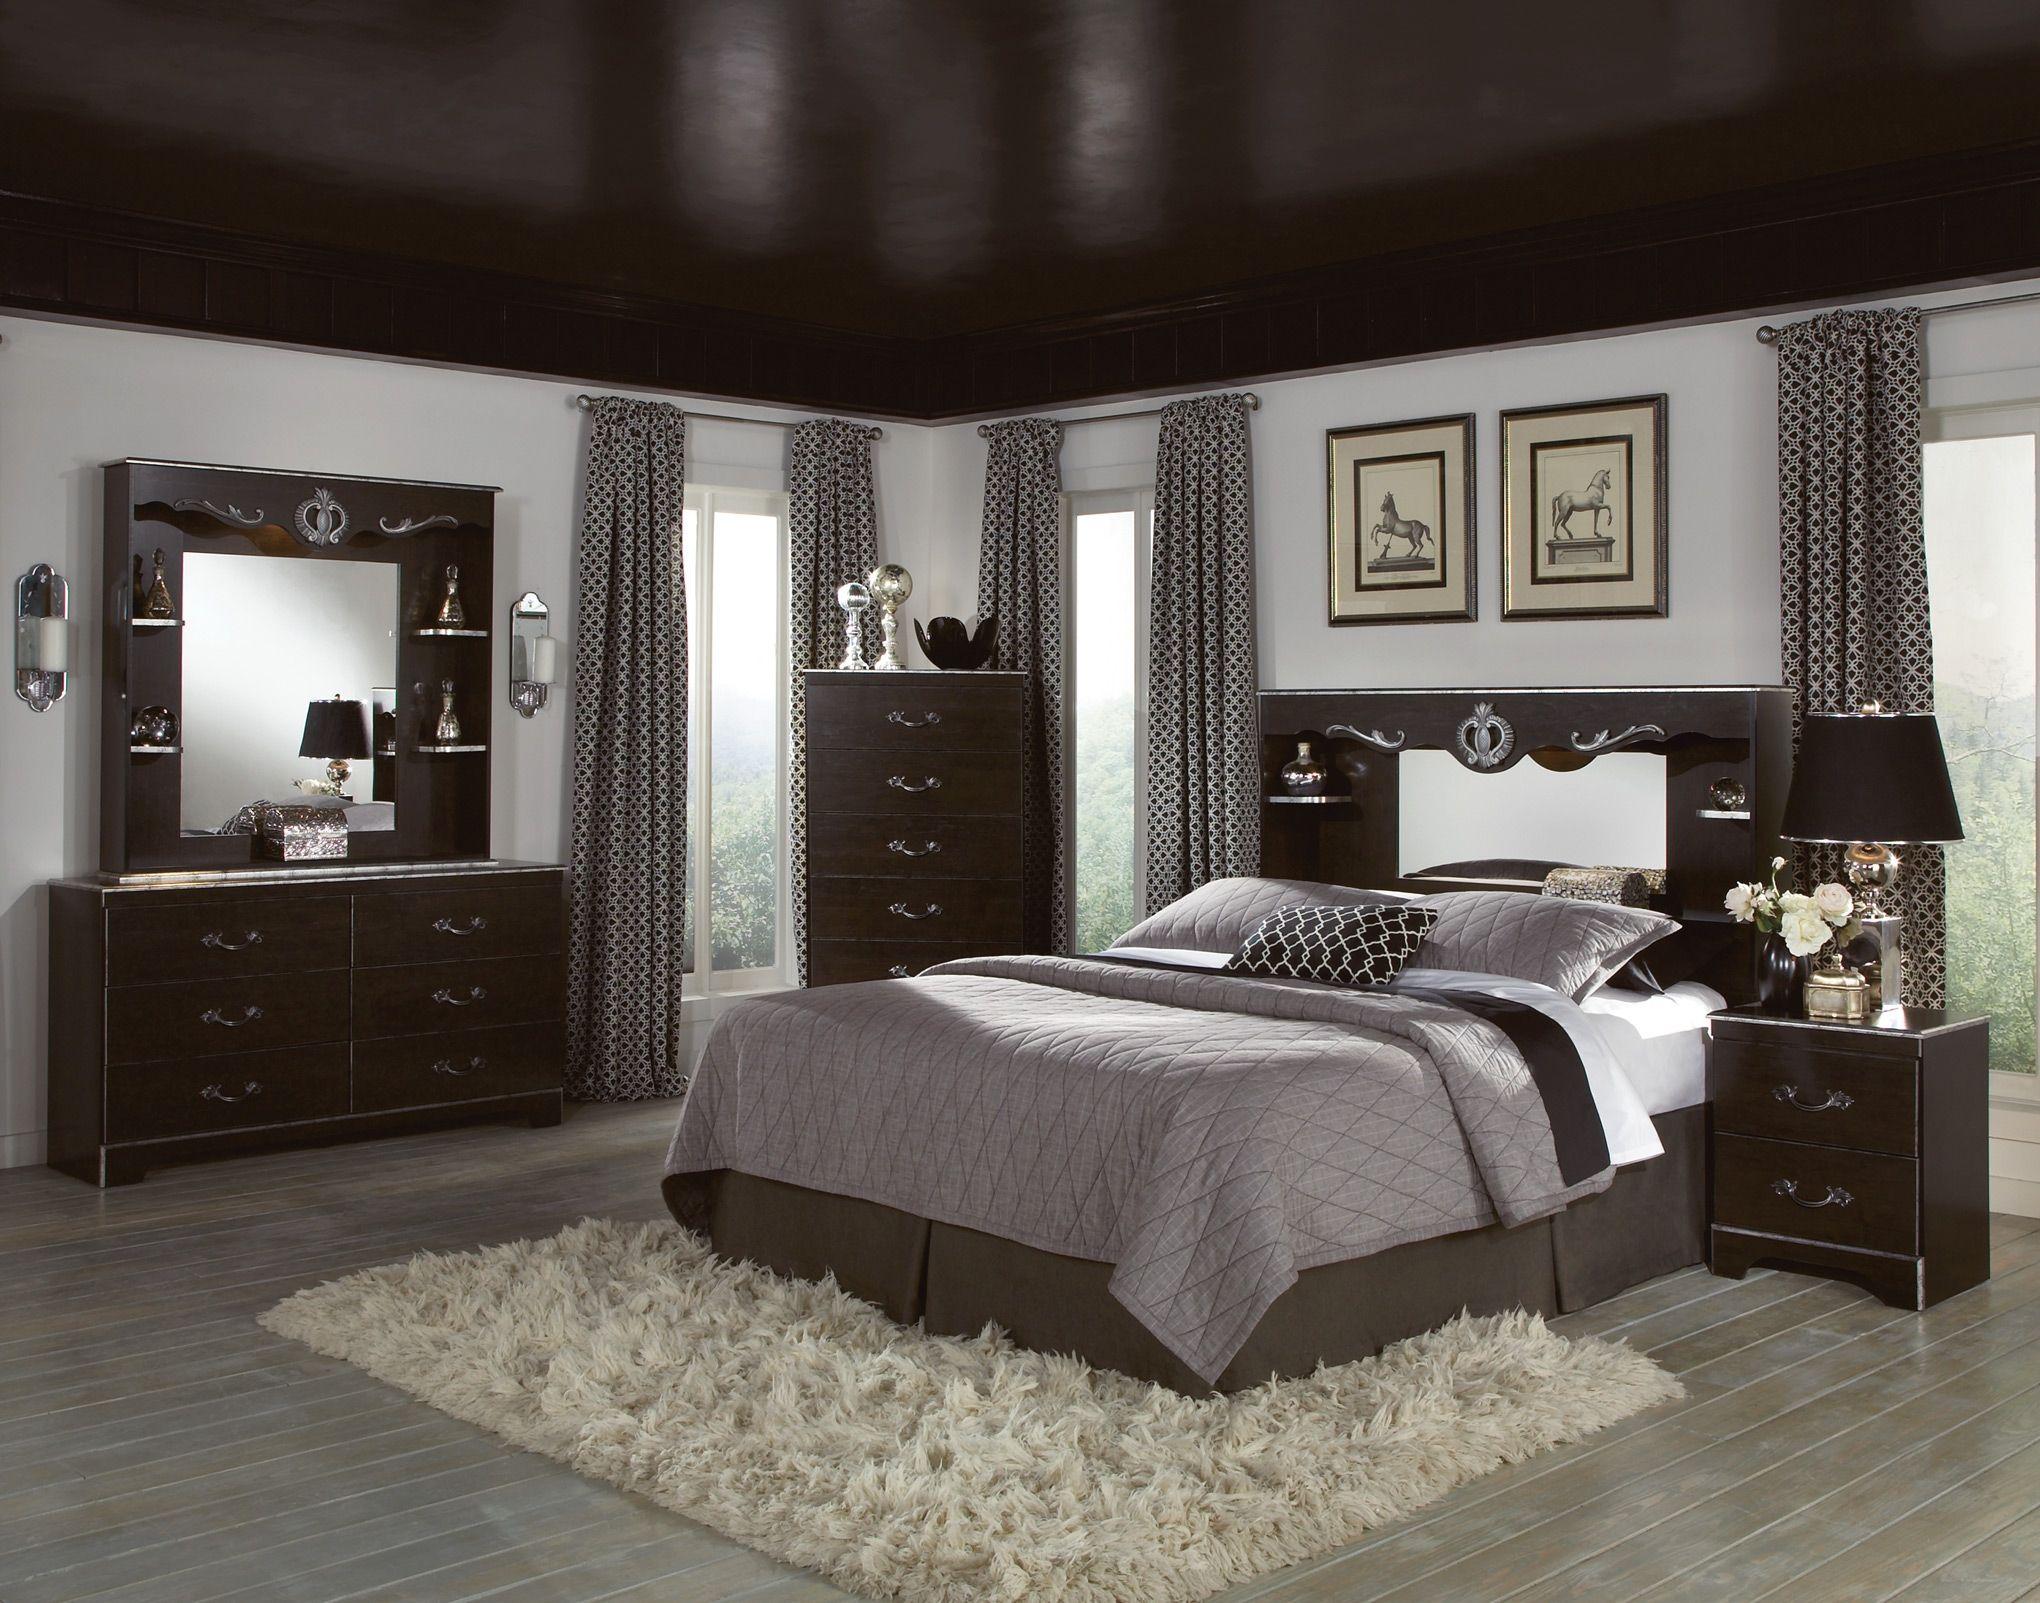 Dark Brown Wood Bedroom Furniture Imagestc Com  Gray master